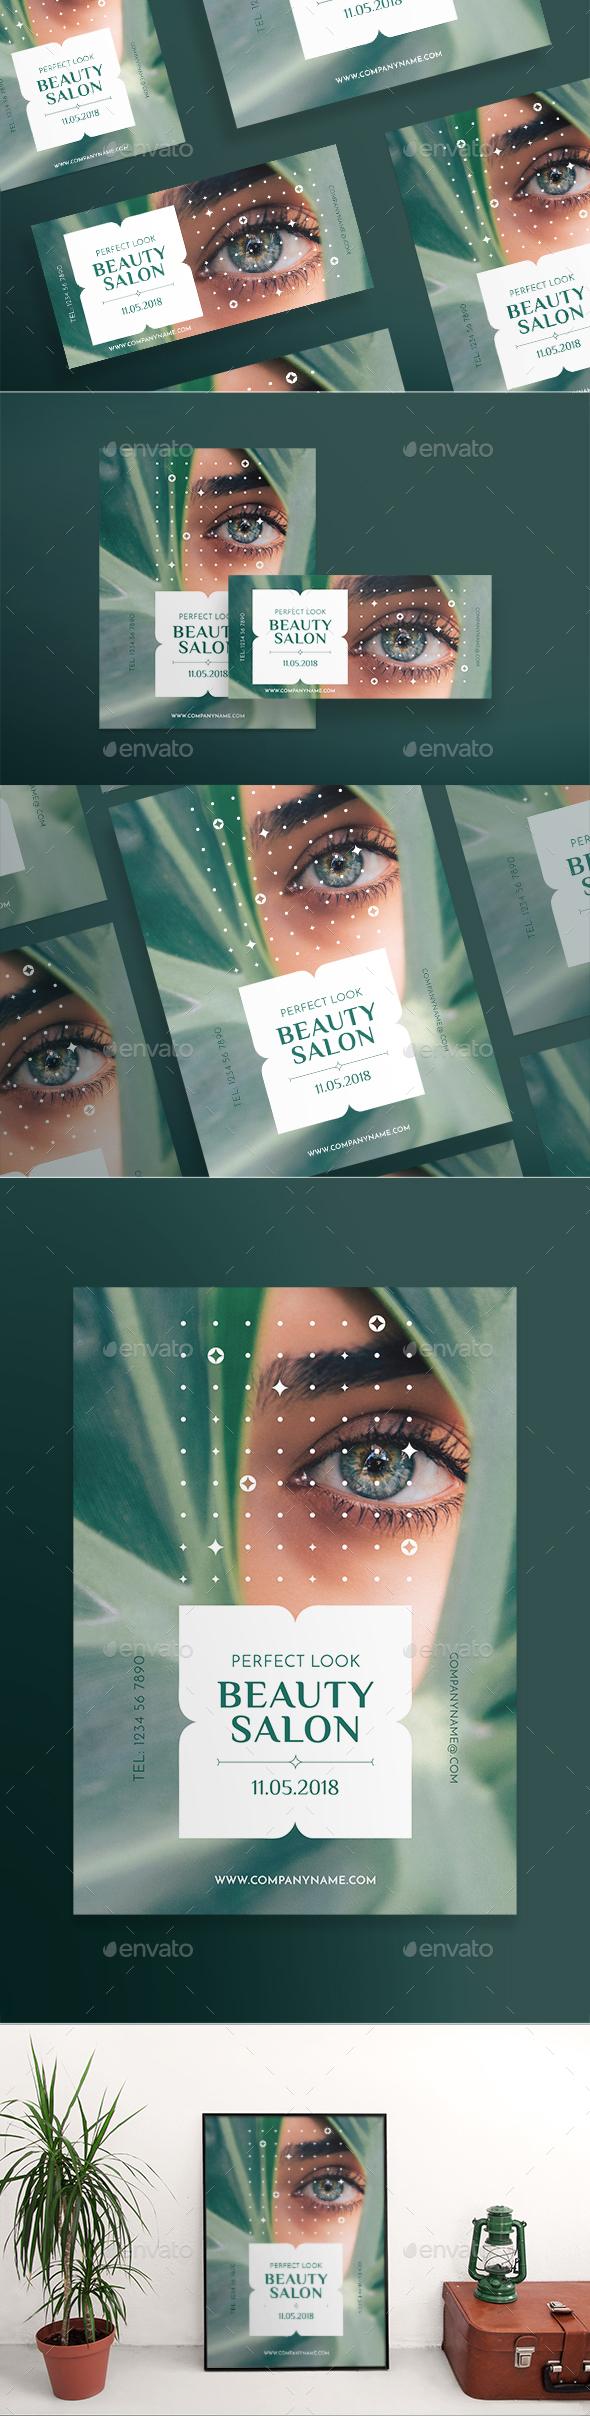 Beauty Salon Flyers - Corporate Flyers